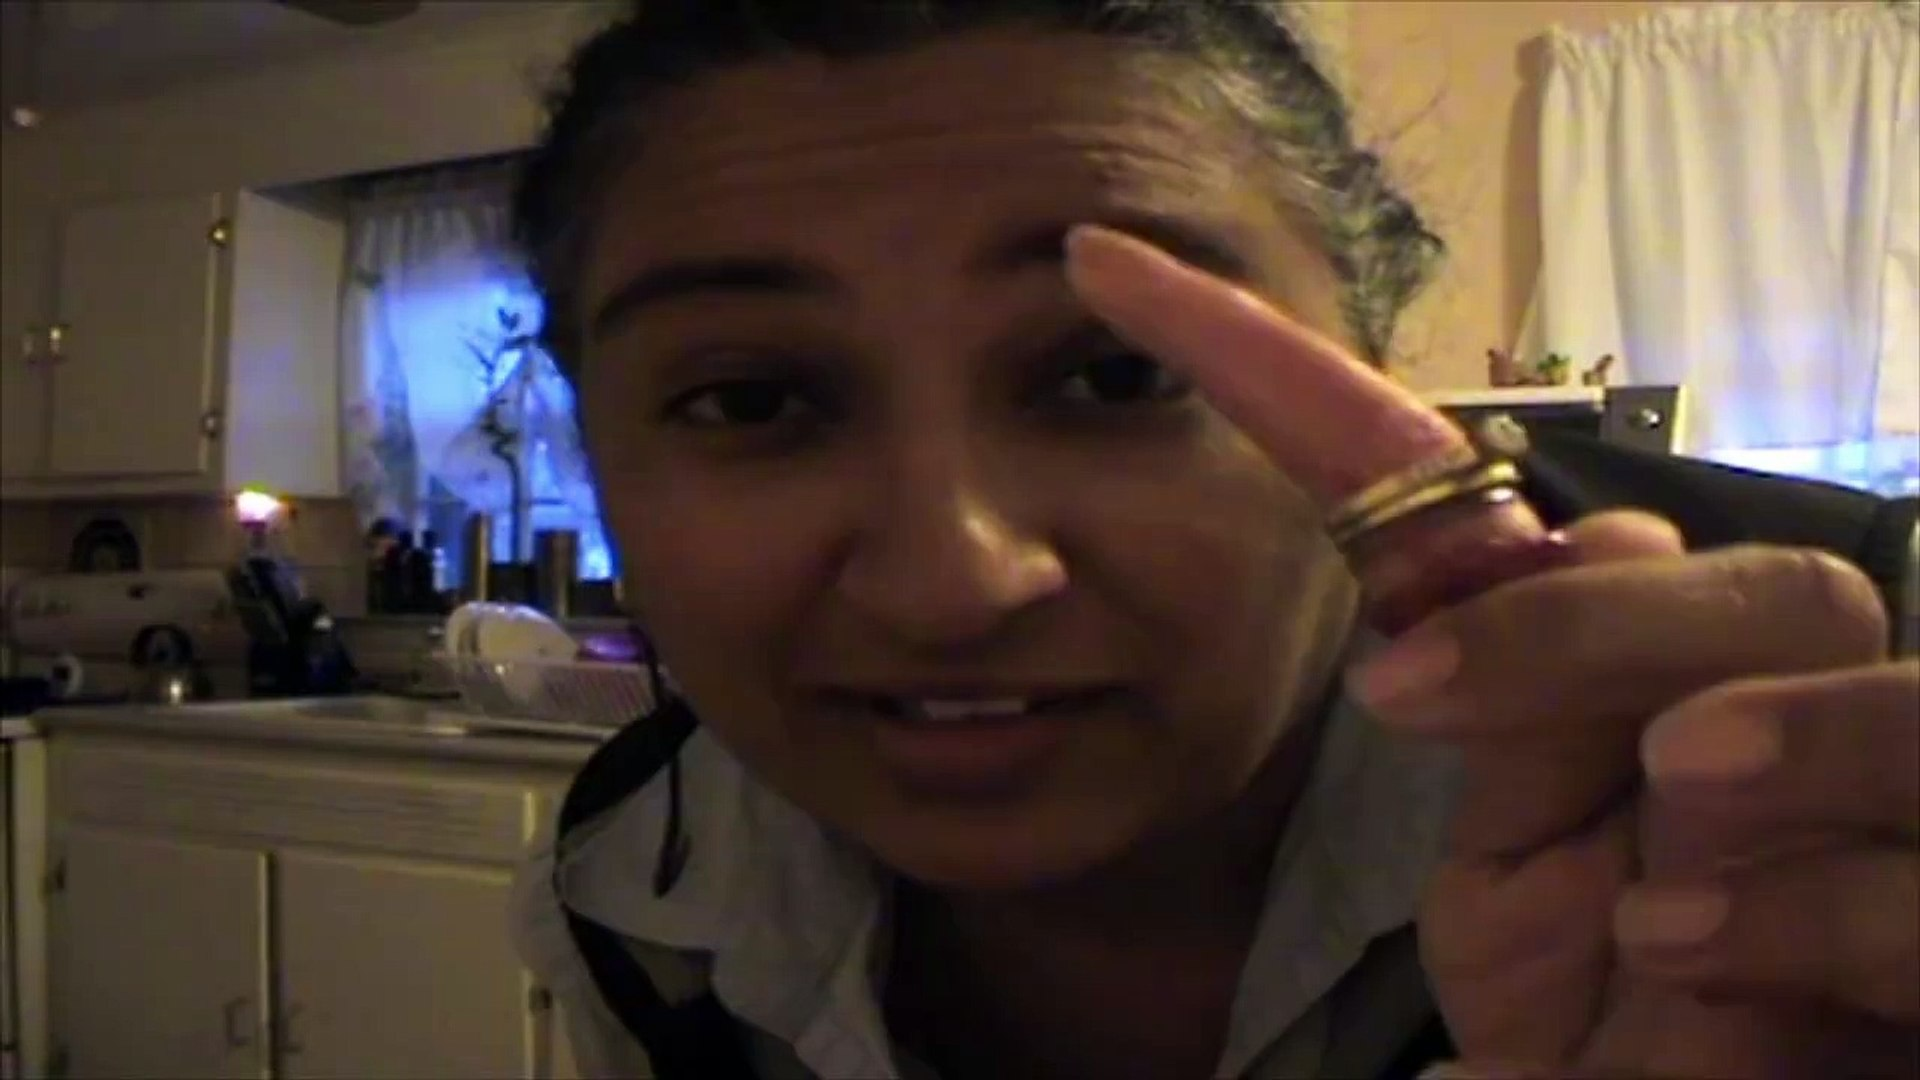 Daughter Pranks Mom With Fake Severed Finger